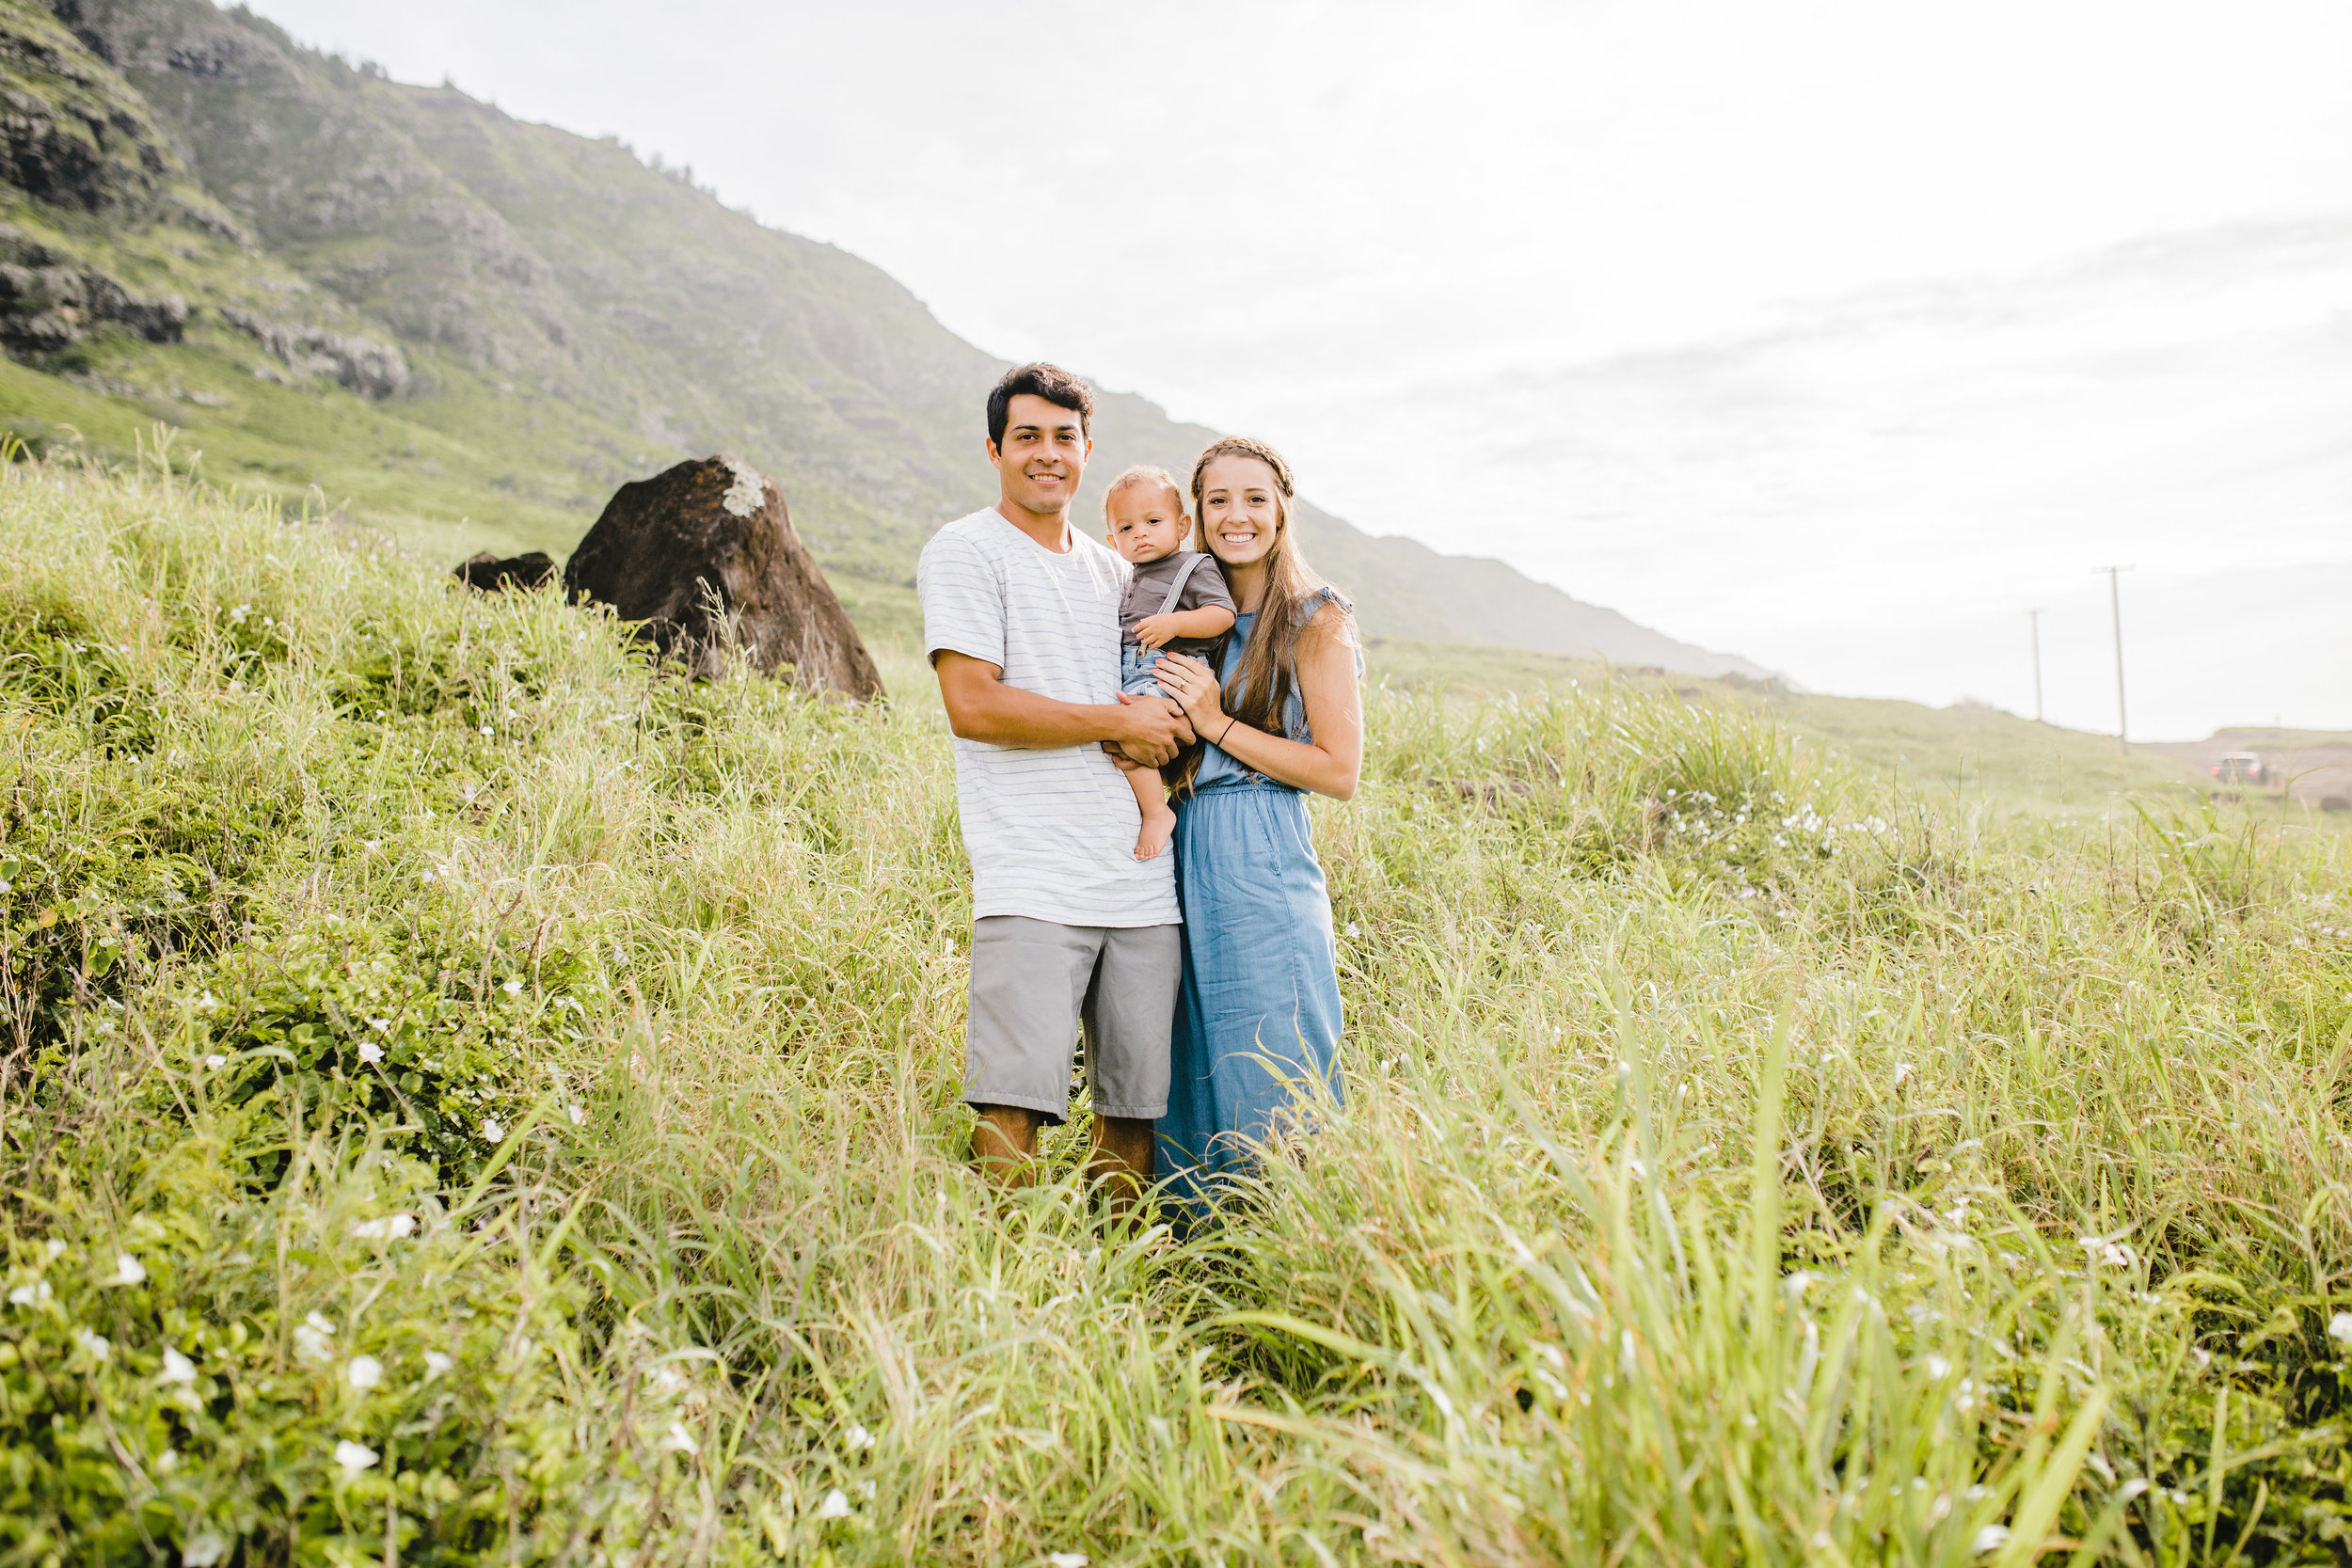 family photographer hawaii beach photos professional family photographer in cache valley logan utah denver colorado honolulu hawaii north shore